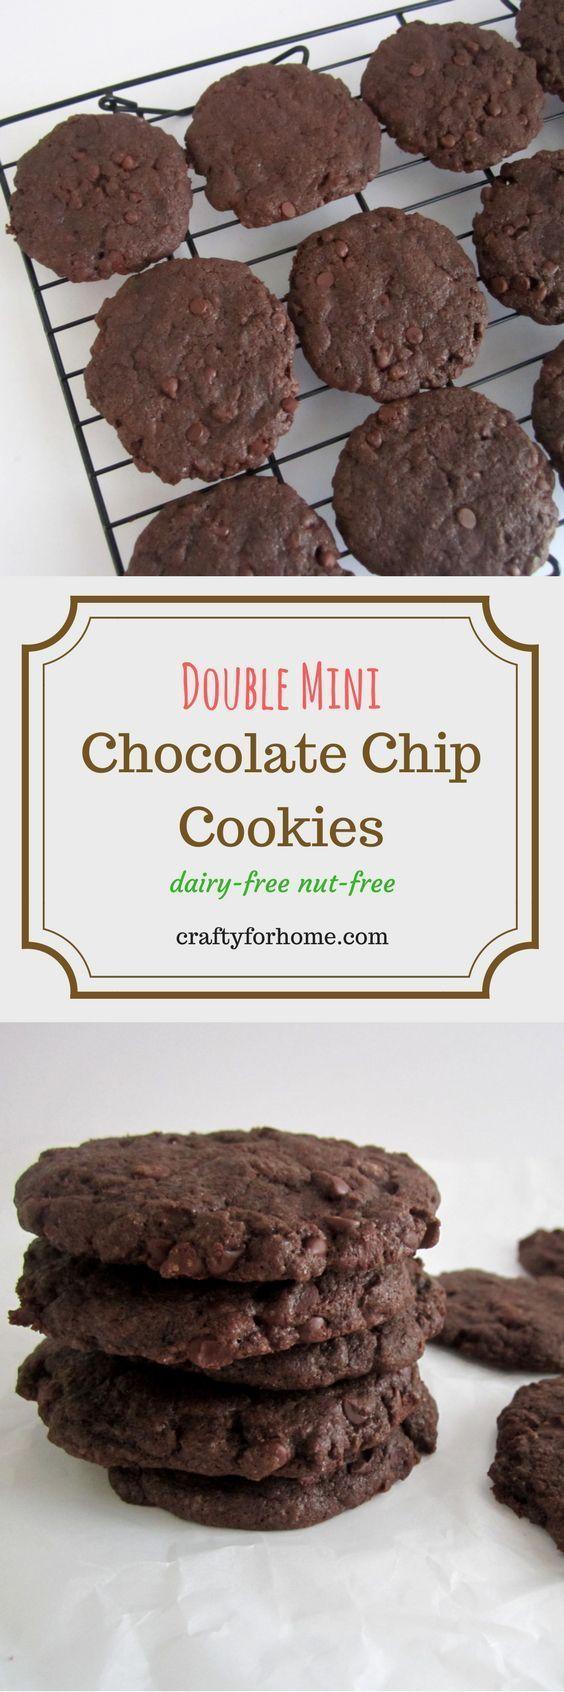 Double Mini Chocolate Chip Cookies #dairyfreecookies #christmascookies #chocolatechipcookies for full recipe on craftyforhome.com